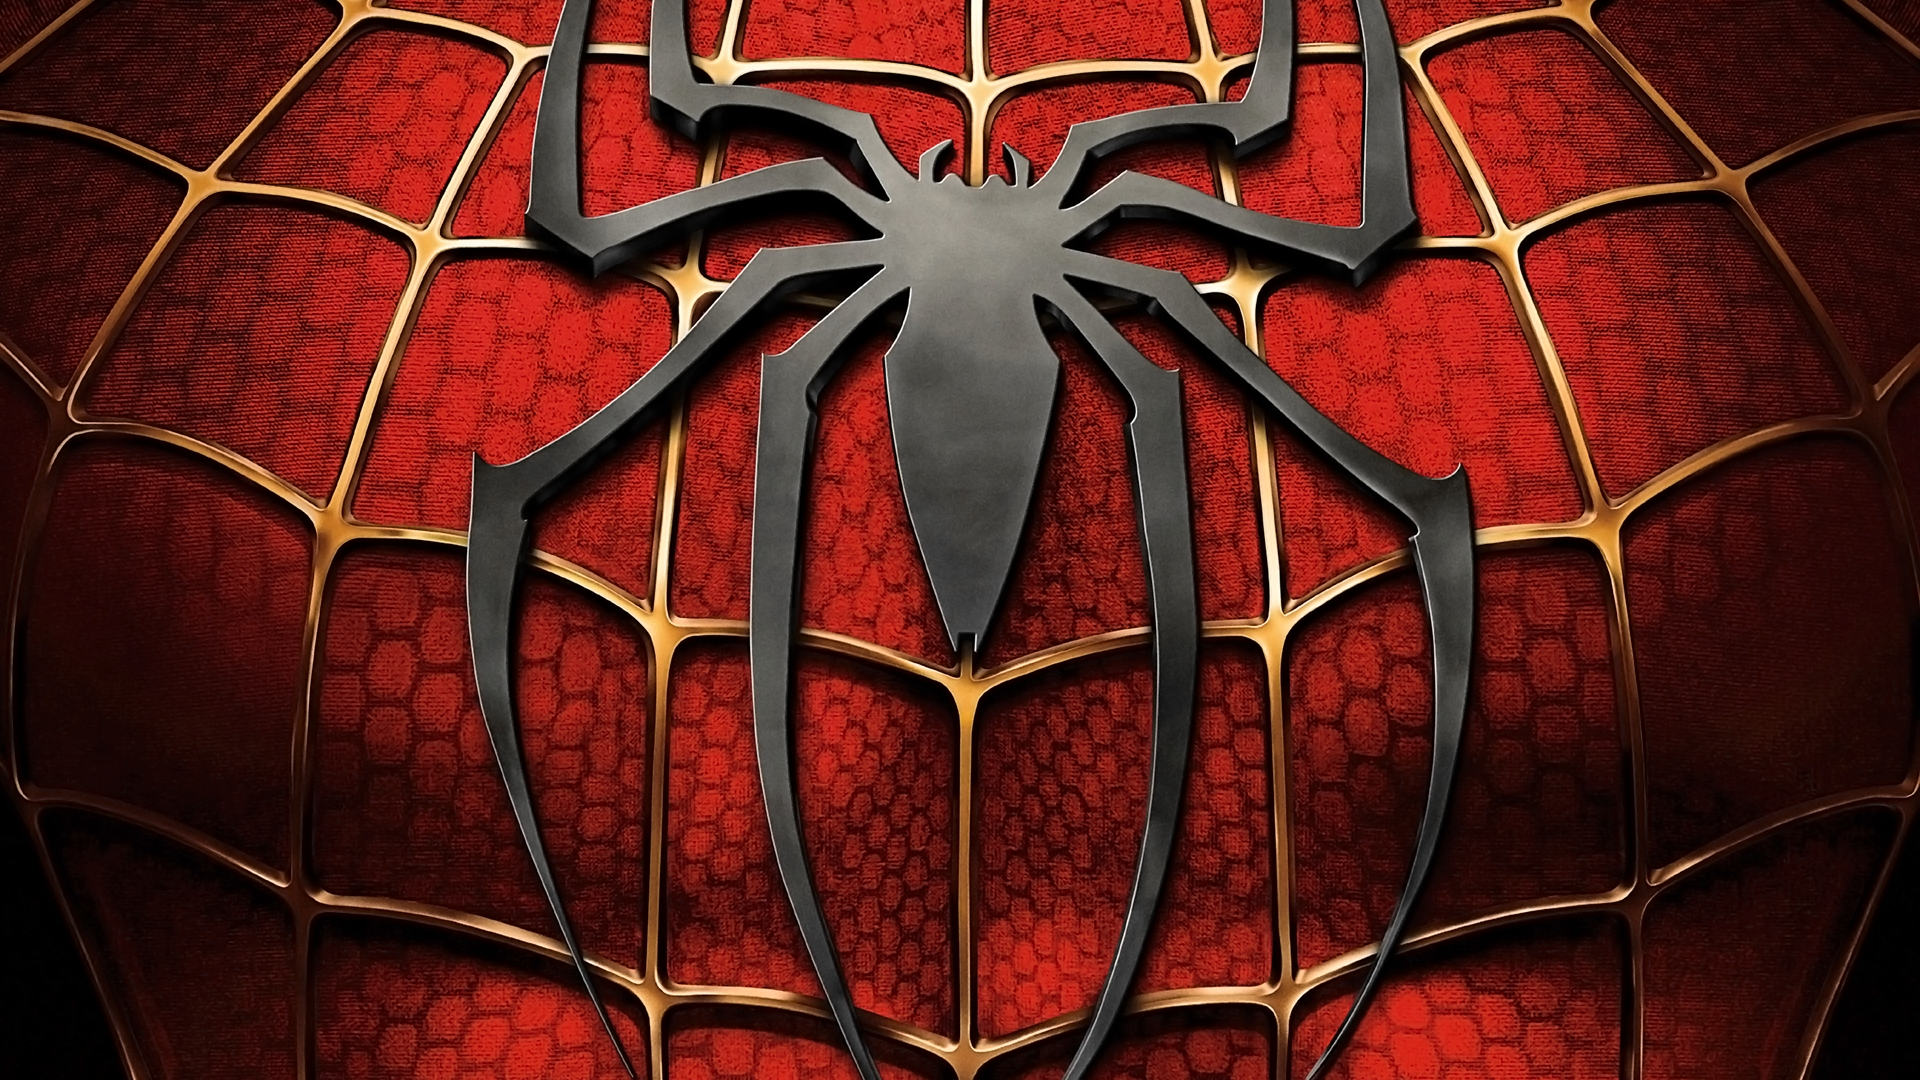 spiderman marvel wallpaper images 1920x1080 1920x1080